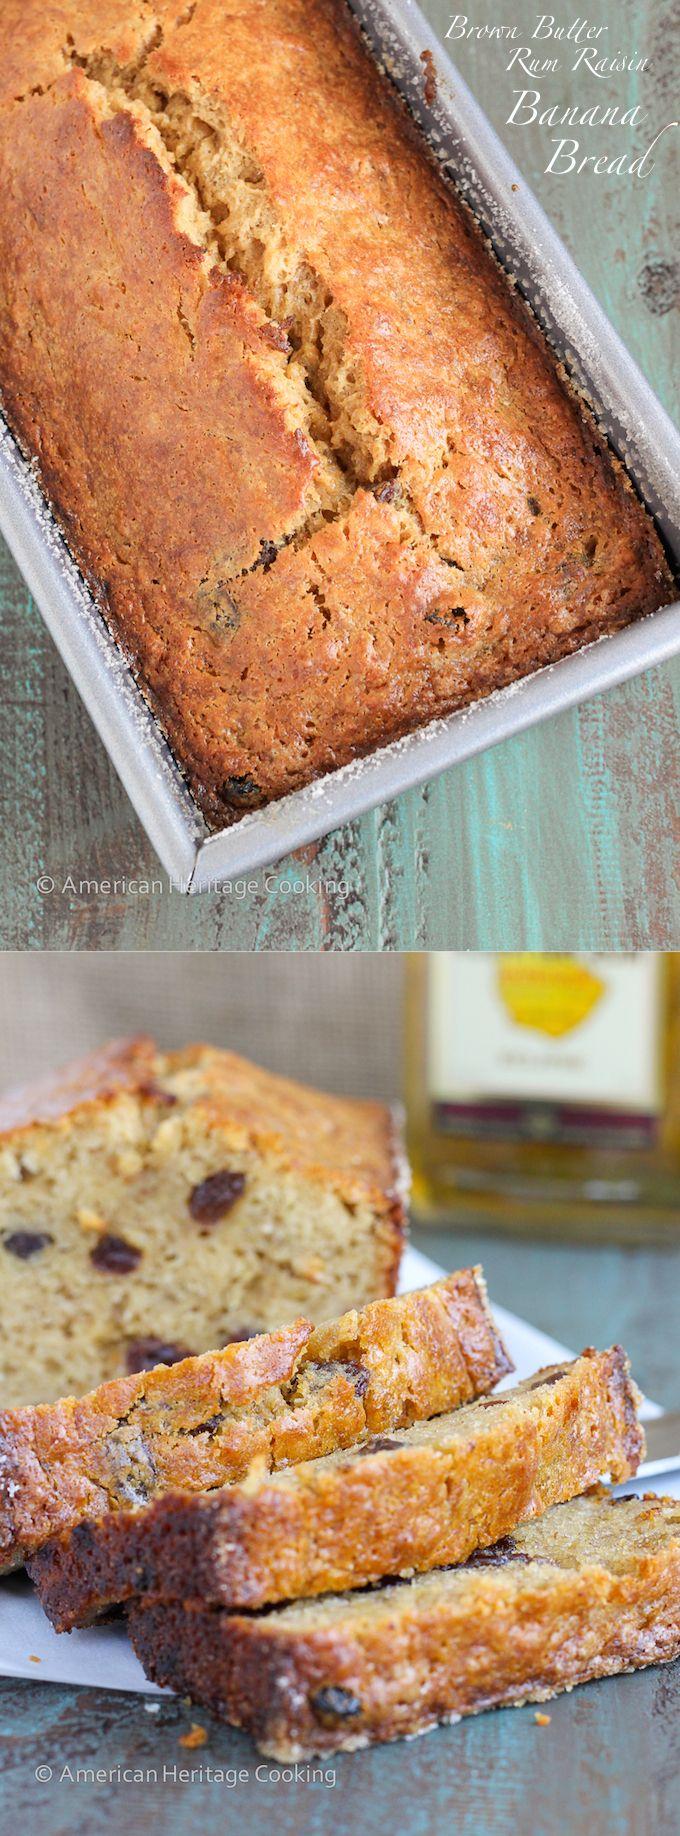 Banana Bread Recipe Using Cake Mix And Applesauce